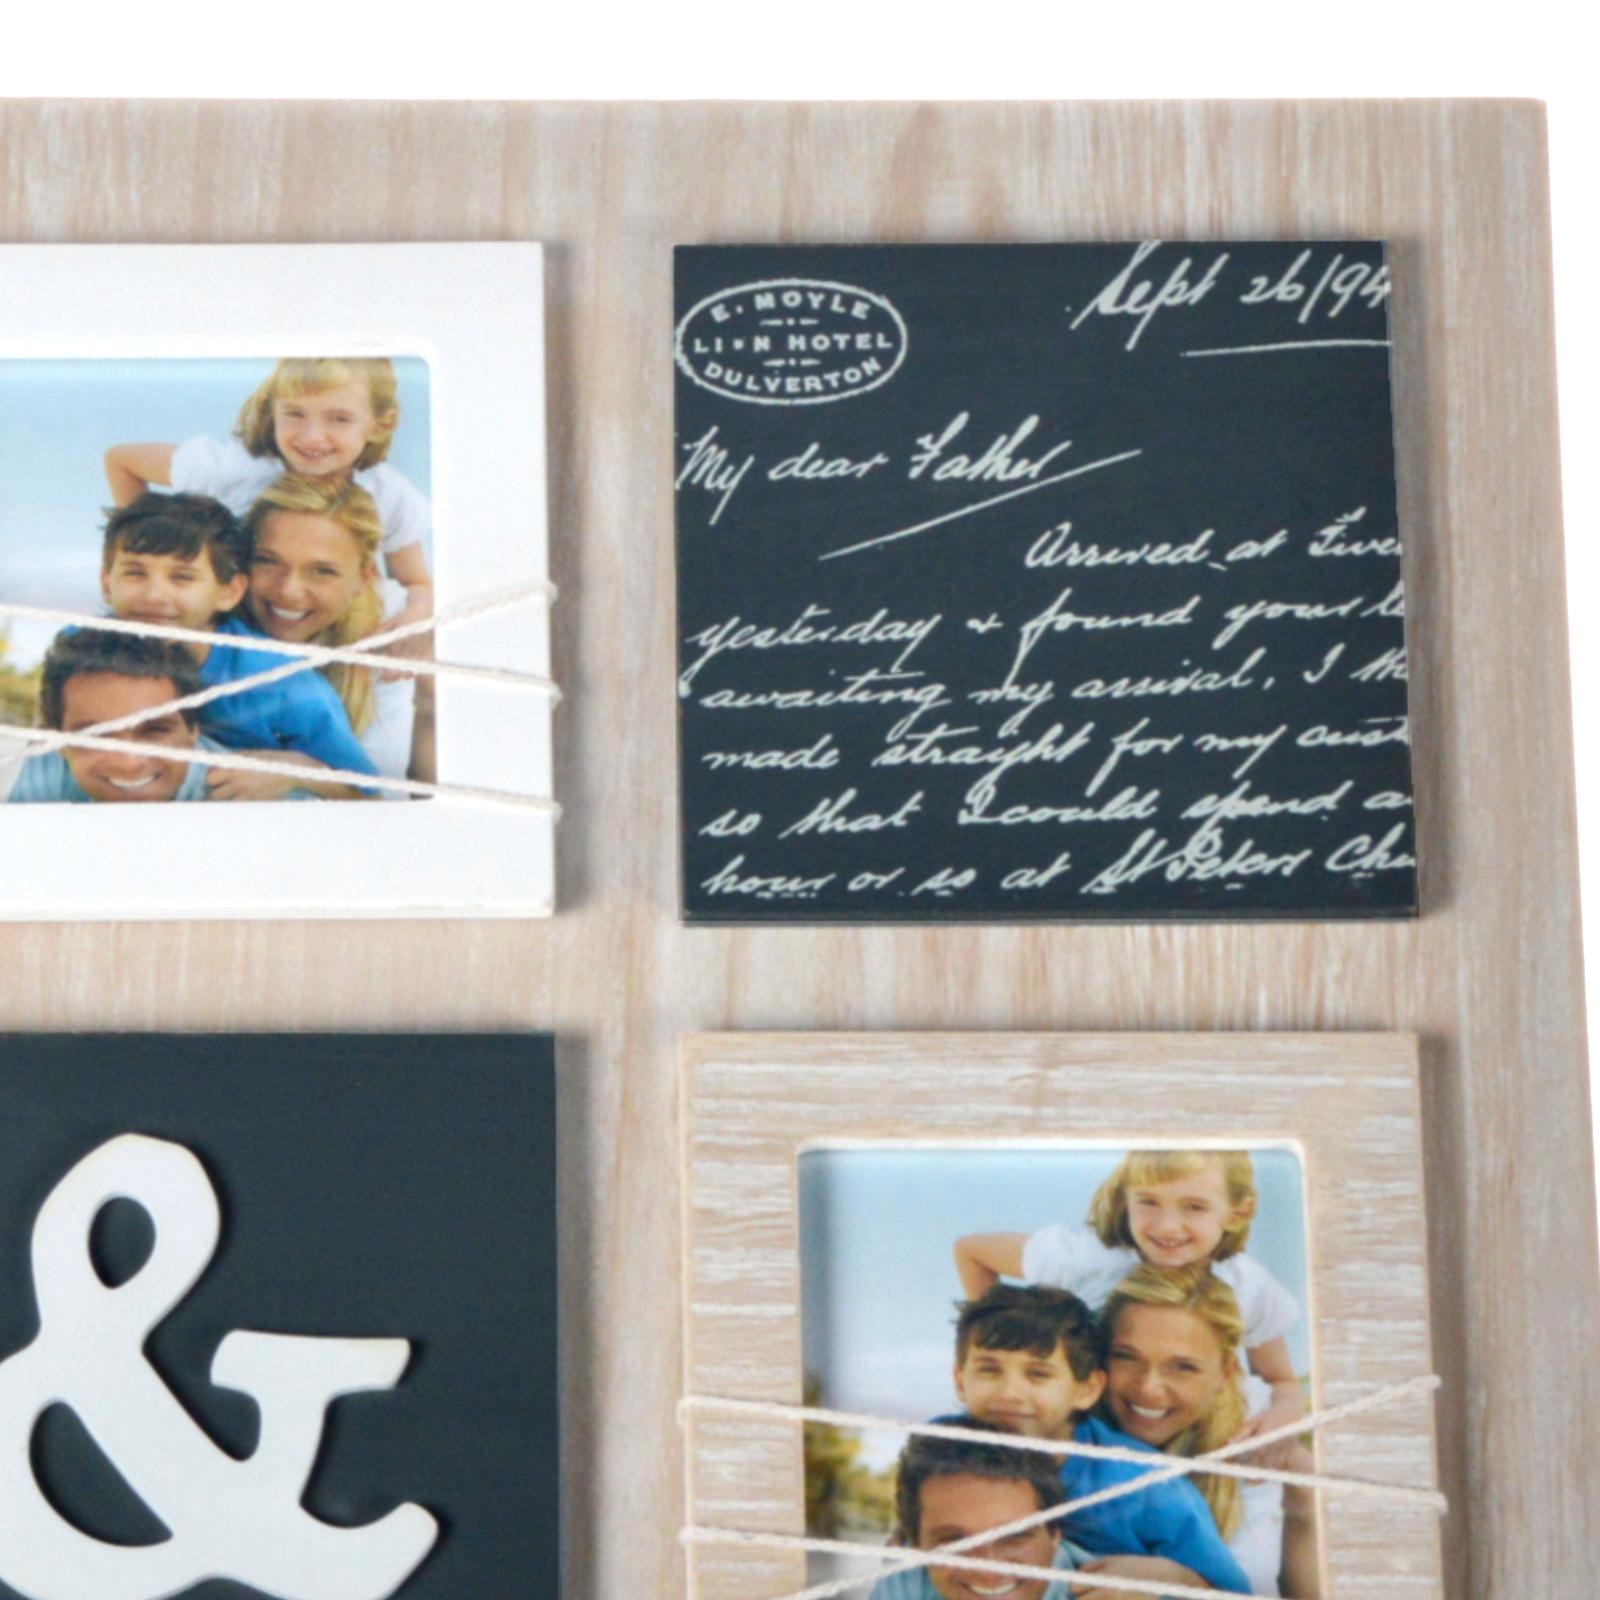 9er bilderrahmen foto galerierahmen 5 fotos kinderbilder wohnzimmer freunde neu. Black Bedroom Furniture Sets. Home Design Ideas